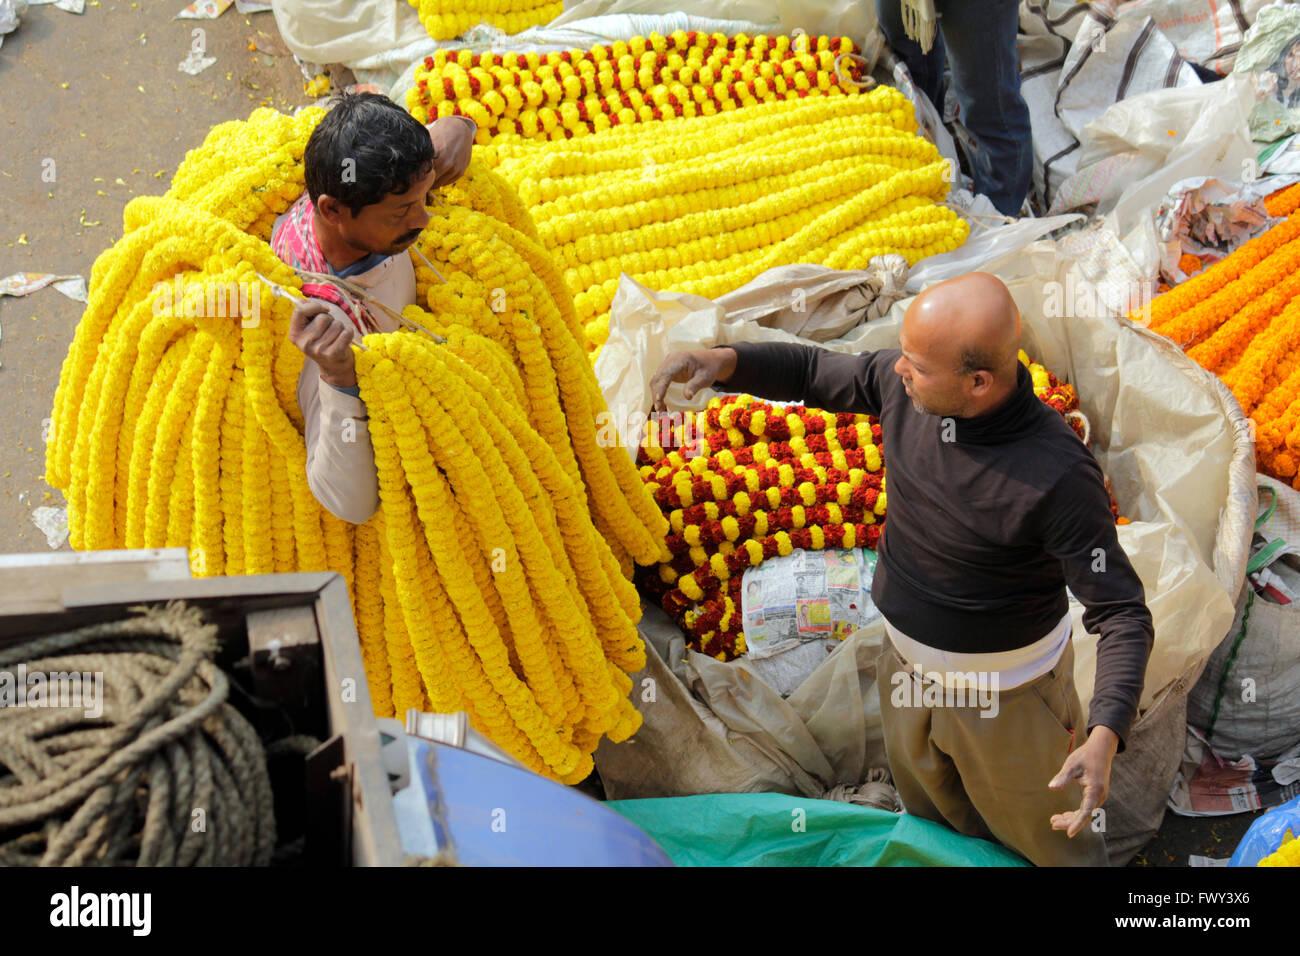 Flower market near Howrah bridge, Kolkata, India. - Stock Image